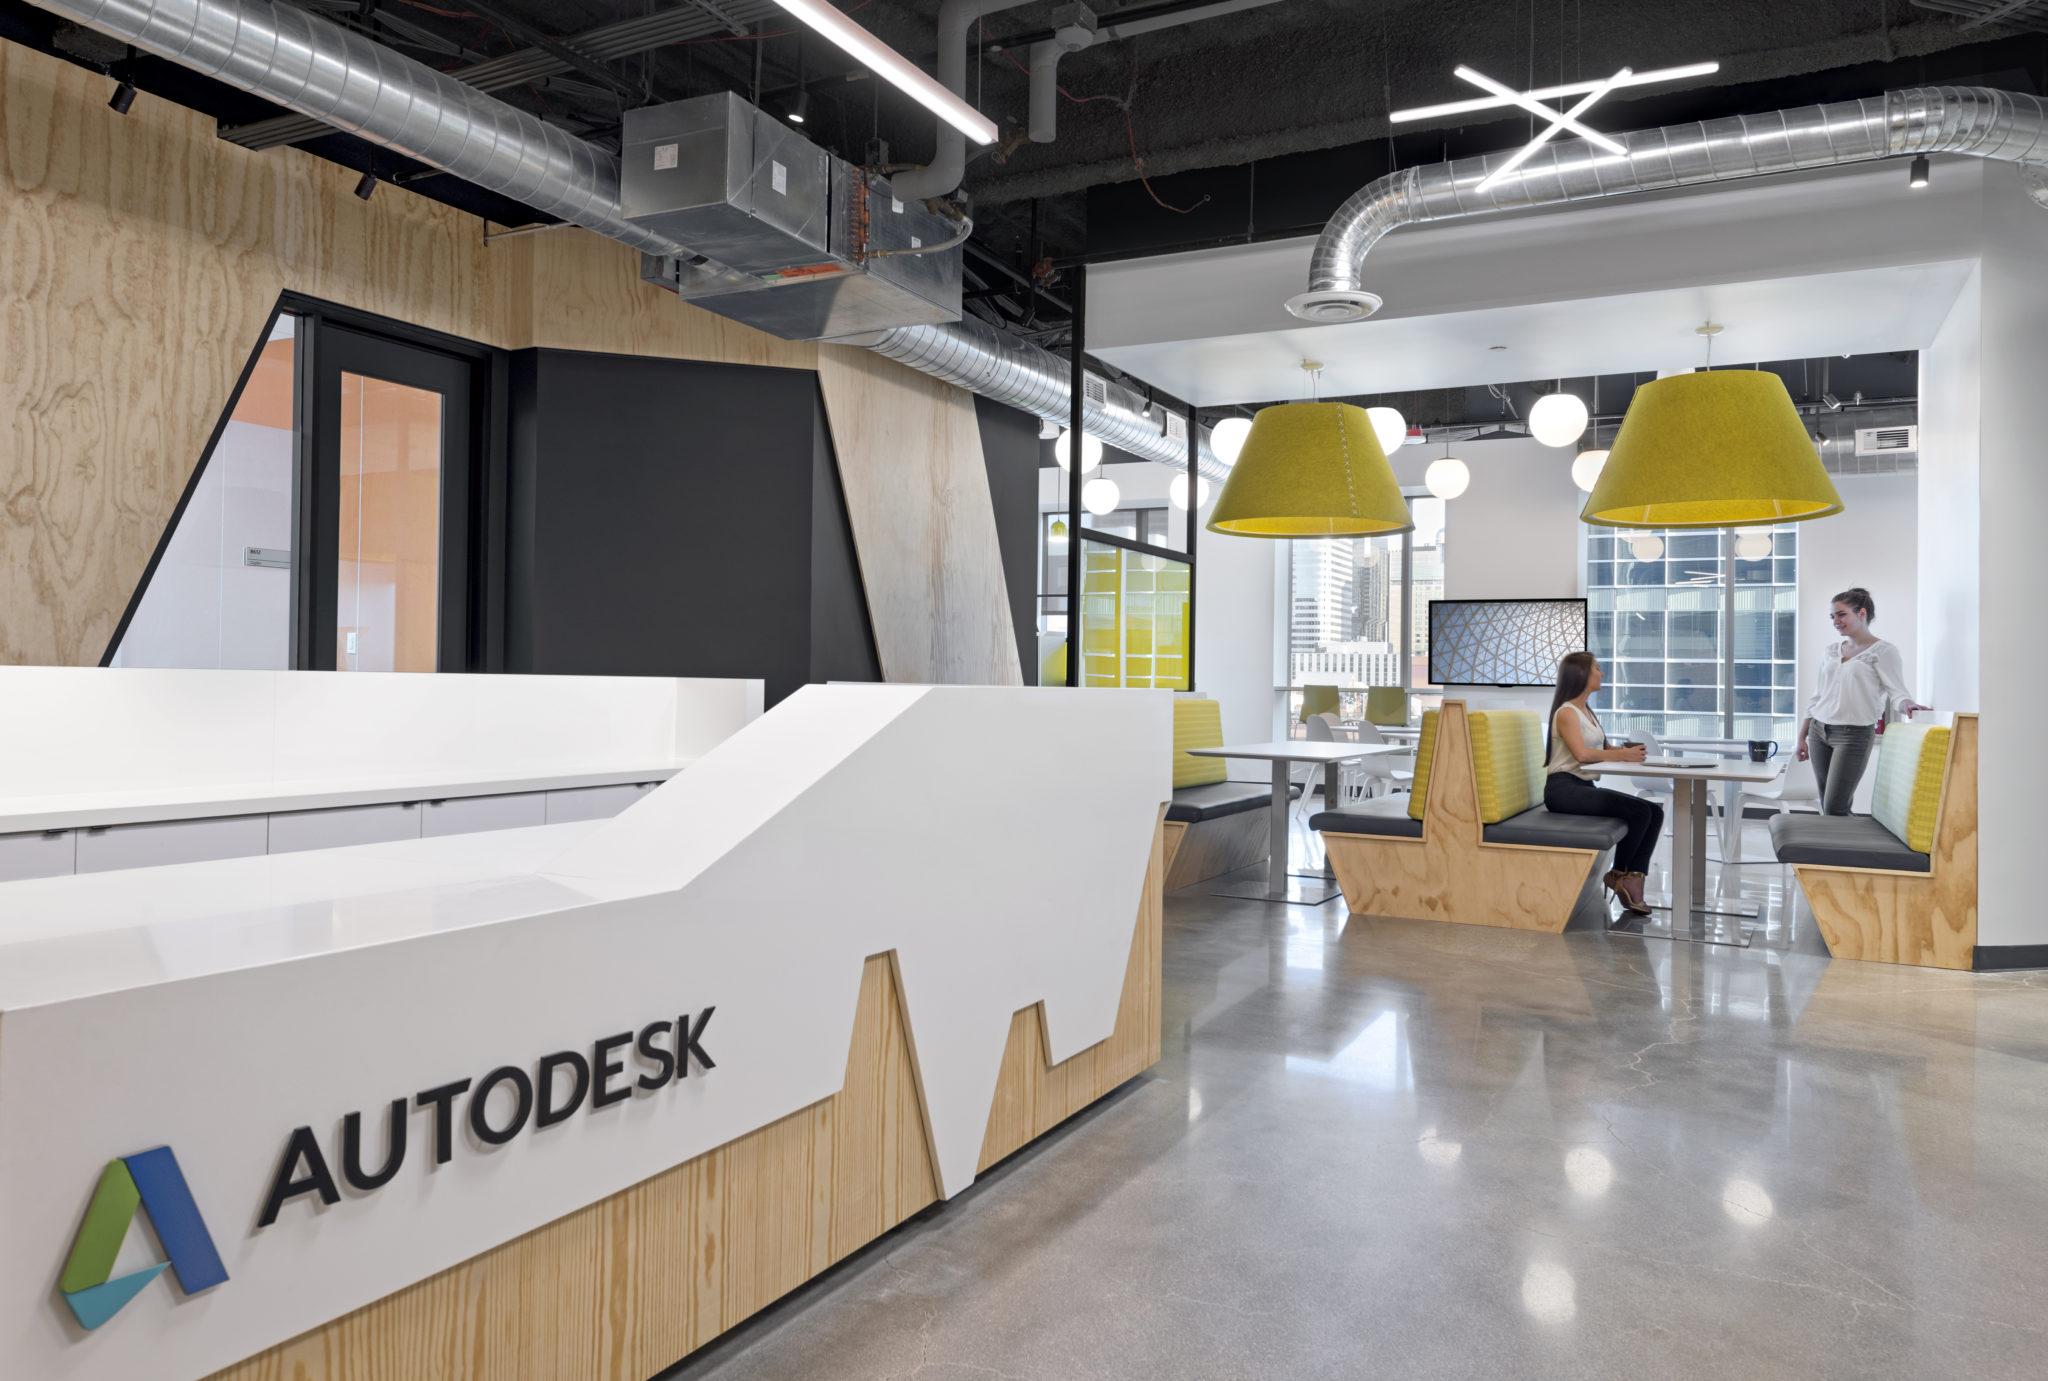 A Peek Inside Autodesk's New Denver Office